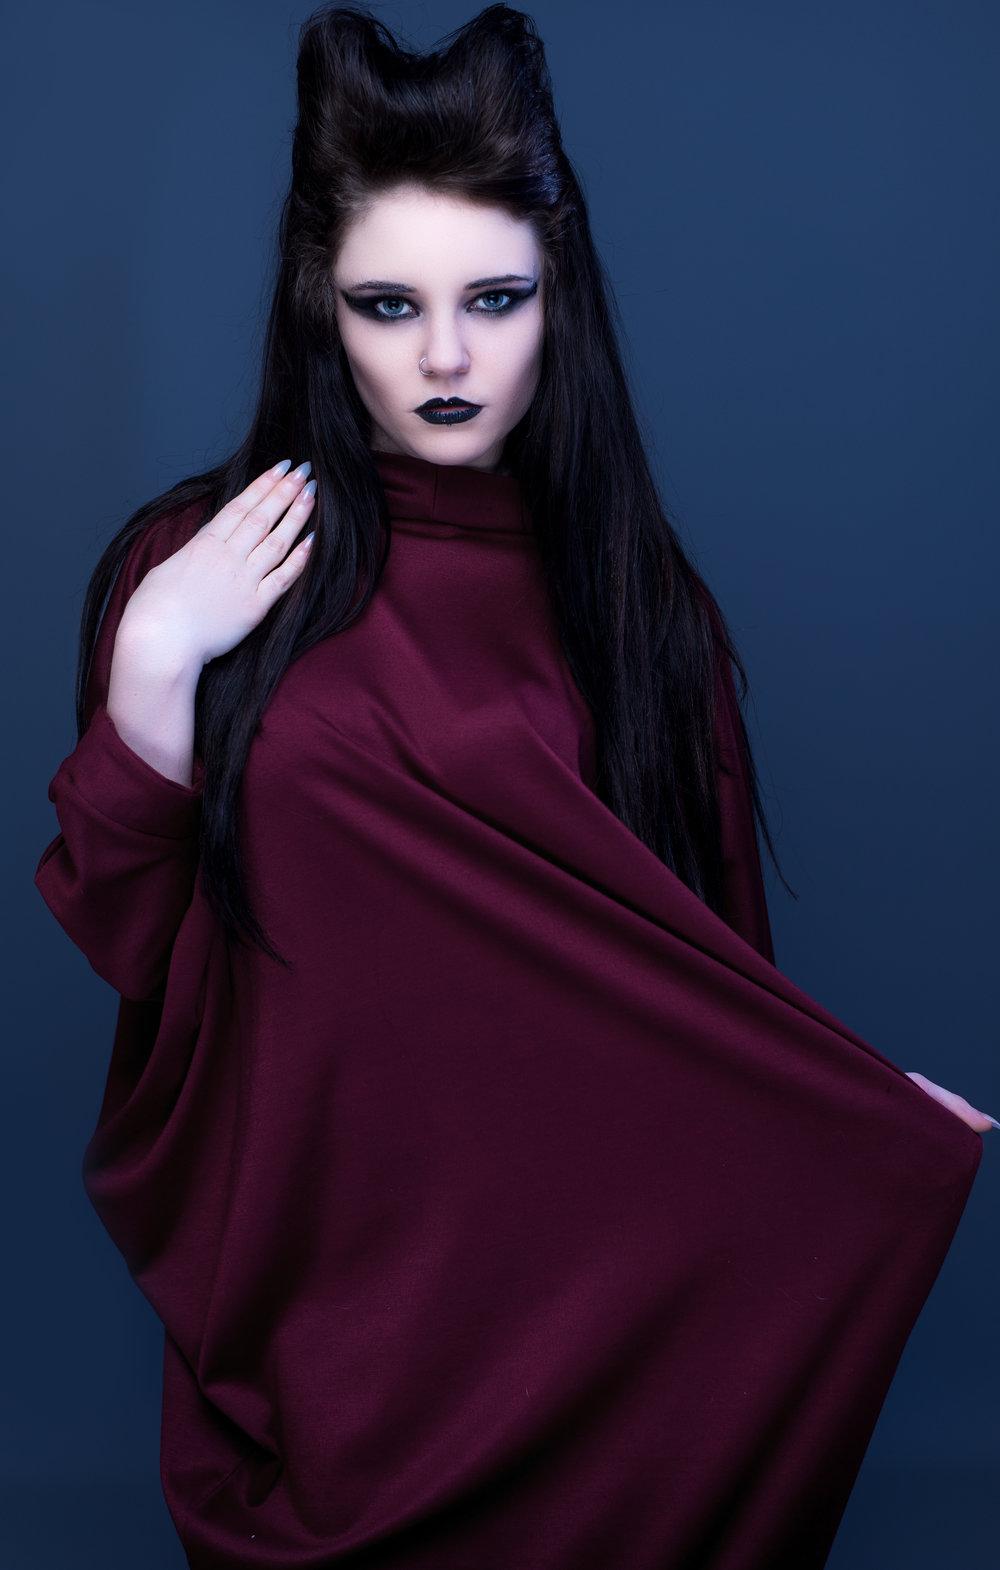 zaramia-ava-zaramiaava-leeds-fashion-designer-ethical-sustainable-tailored-minimalist-aya-burgundy-black-obi-belt-dress-versatile-drape-cowl-styling-studio-womenswear-models-photoshoot-vibrant-14